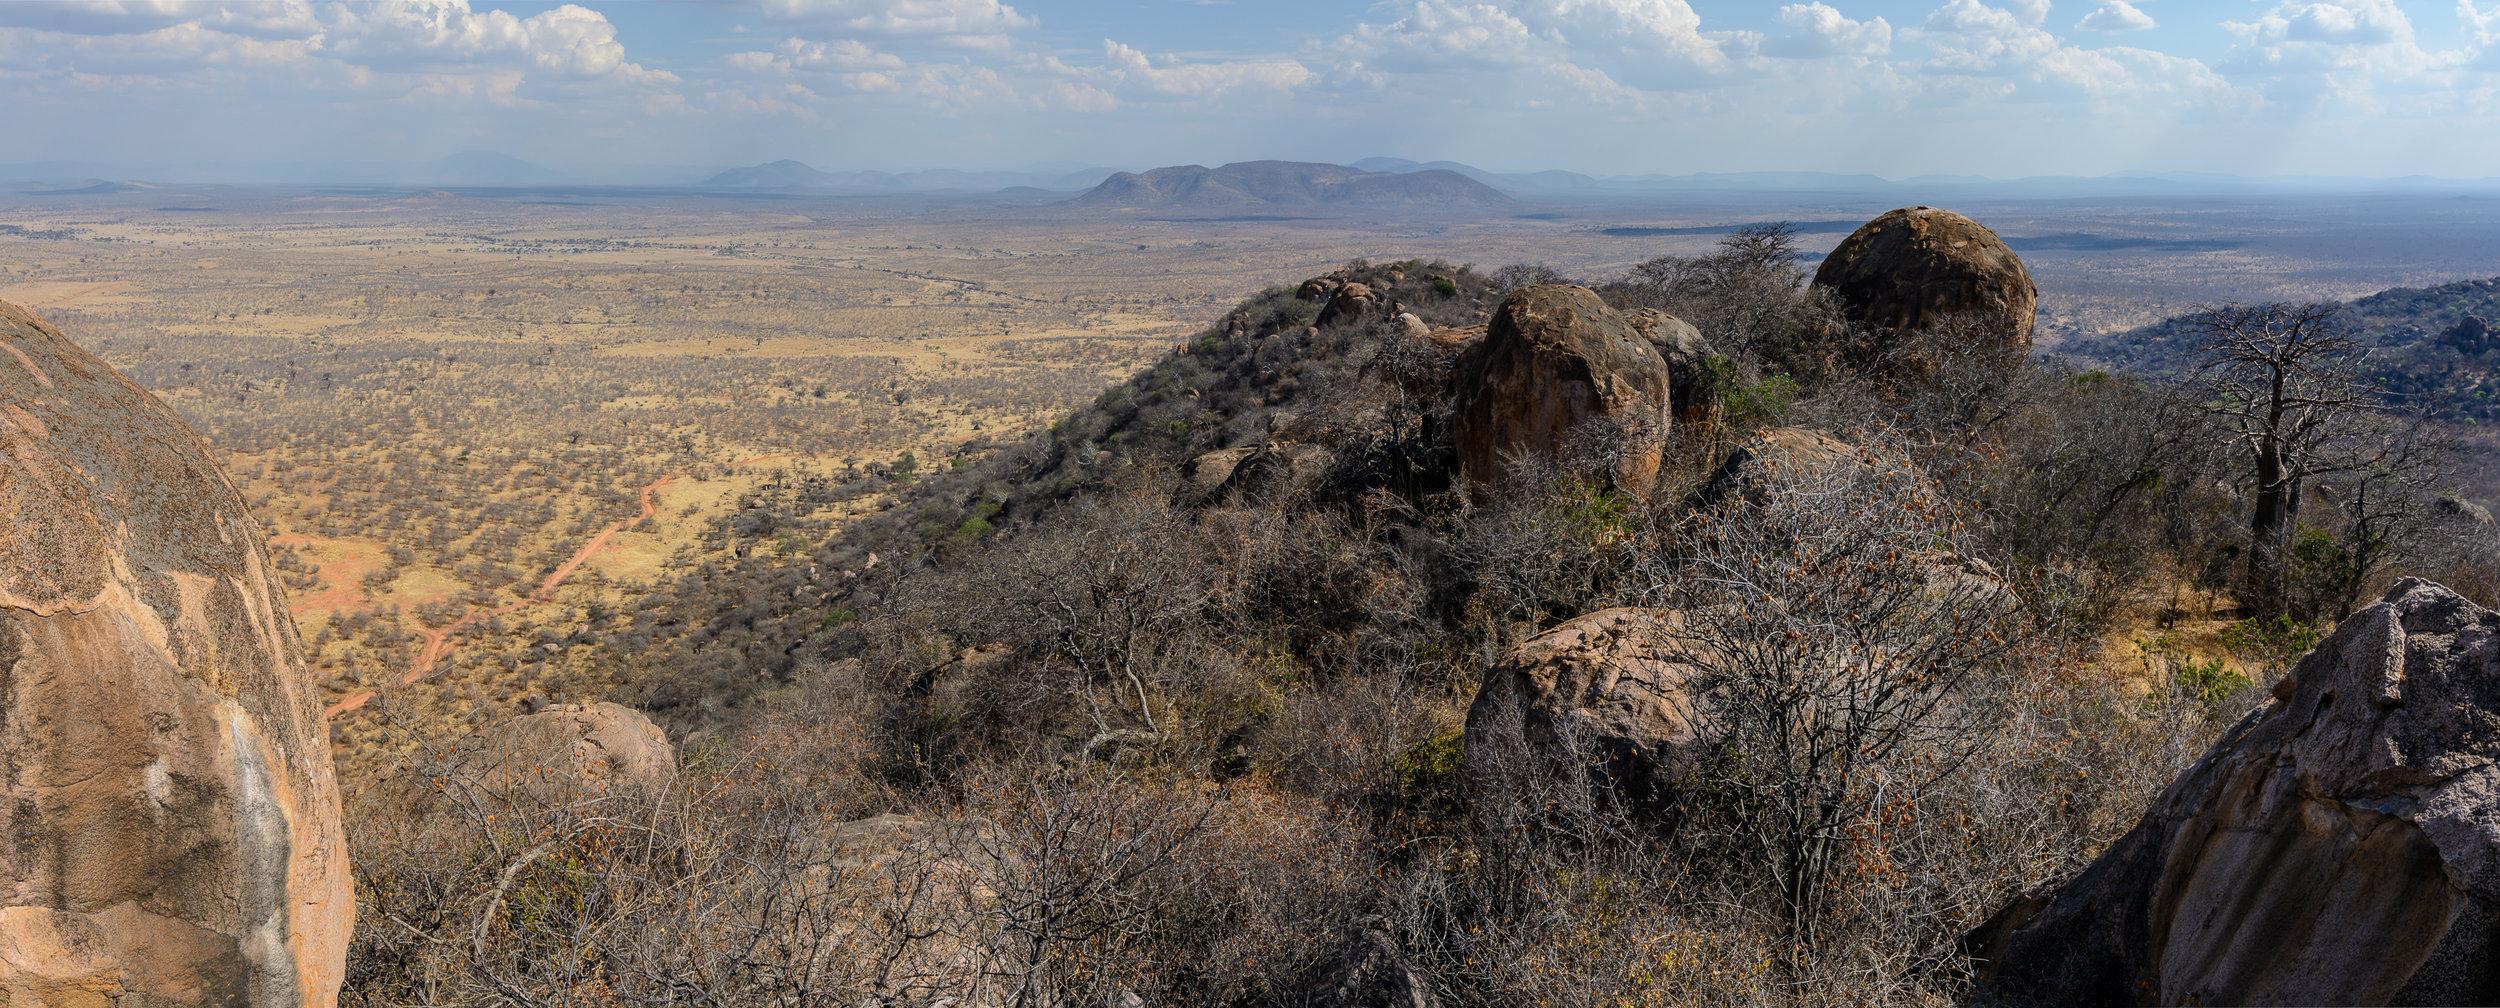 Jabali-Ridge-view-kopjes.jpg